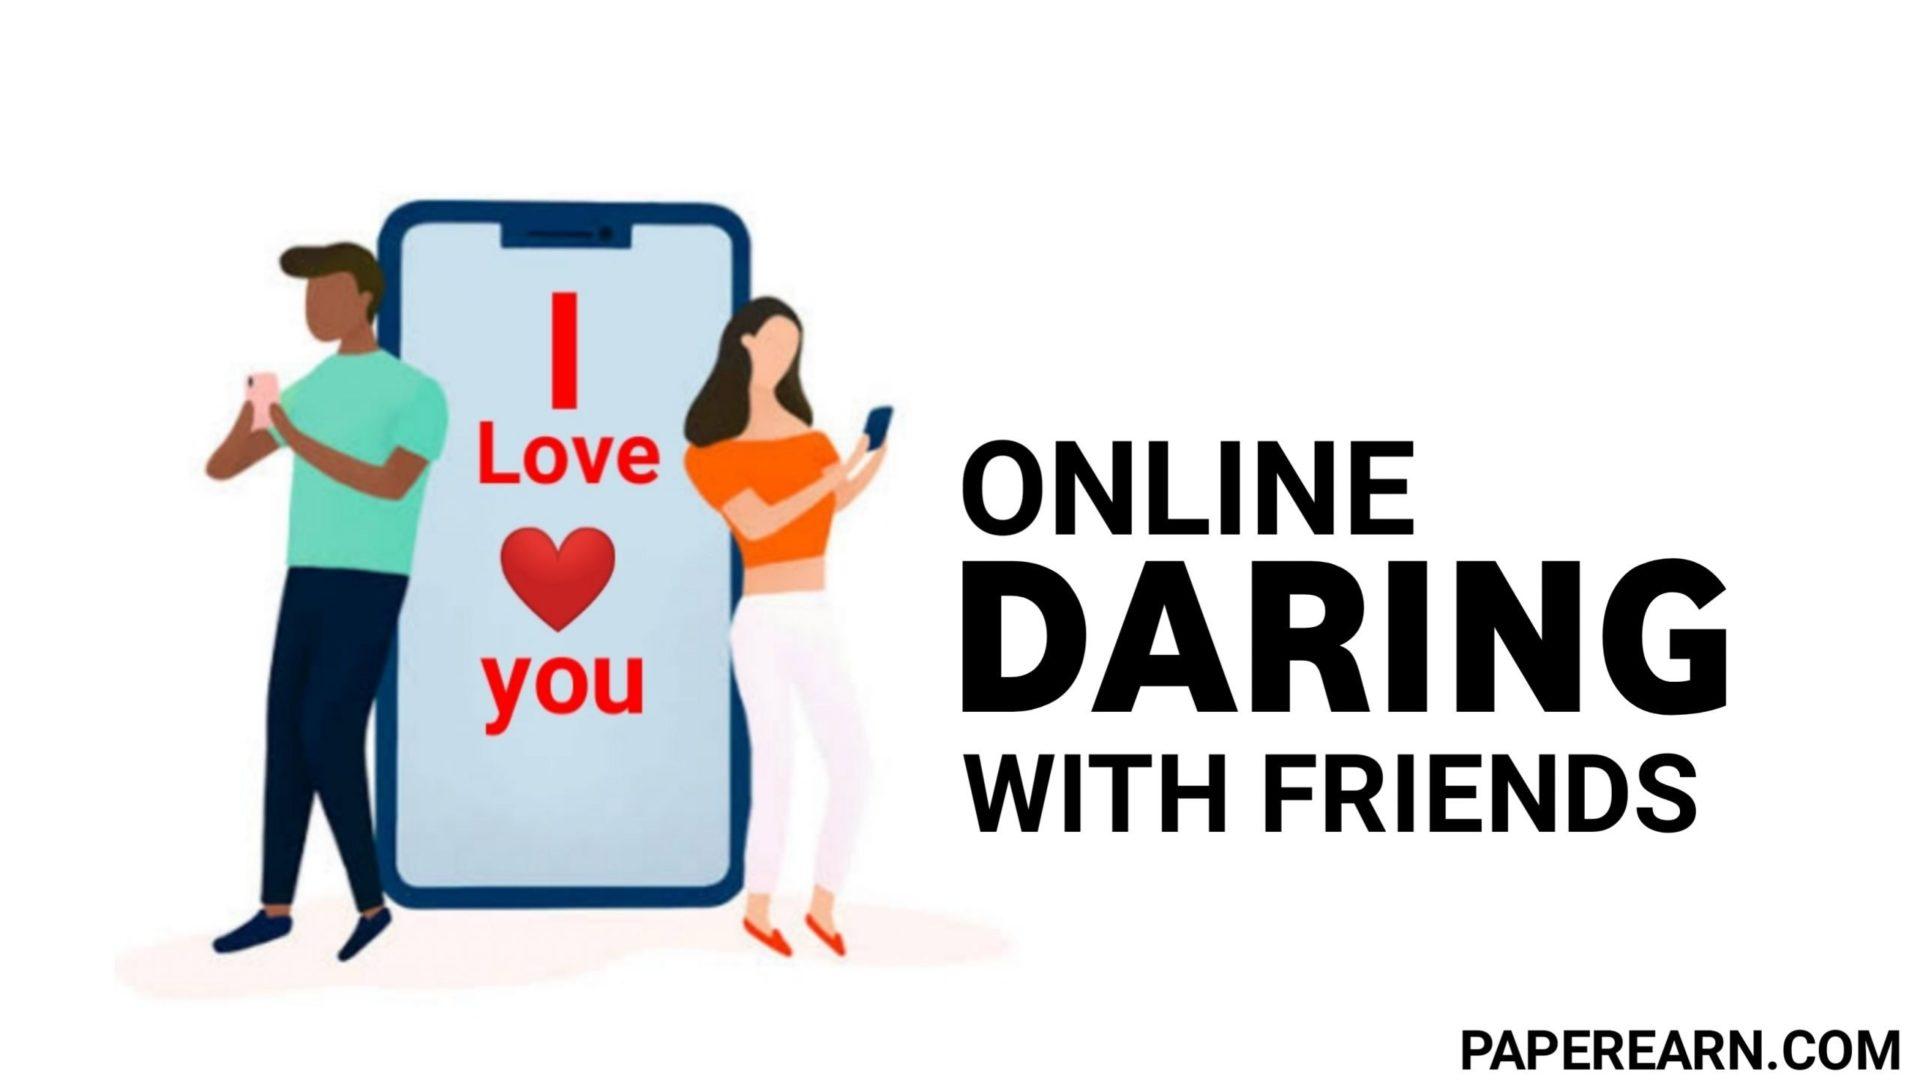 Chat with girl online veggo App - paperearn.com